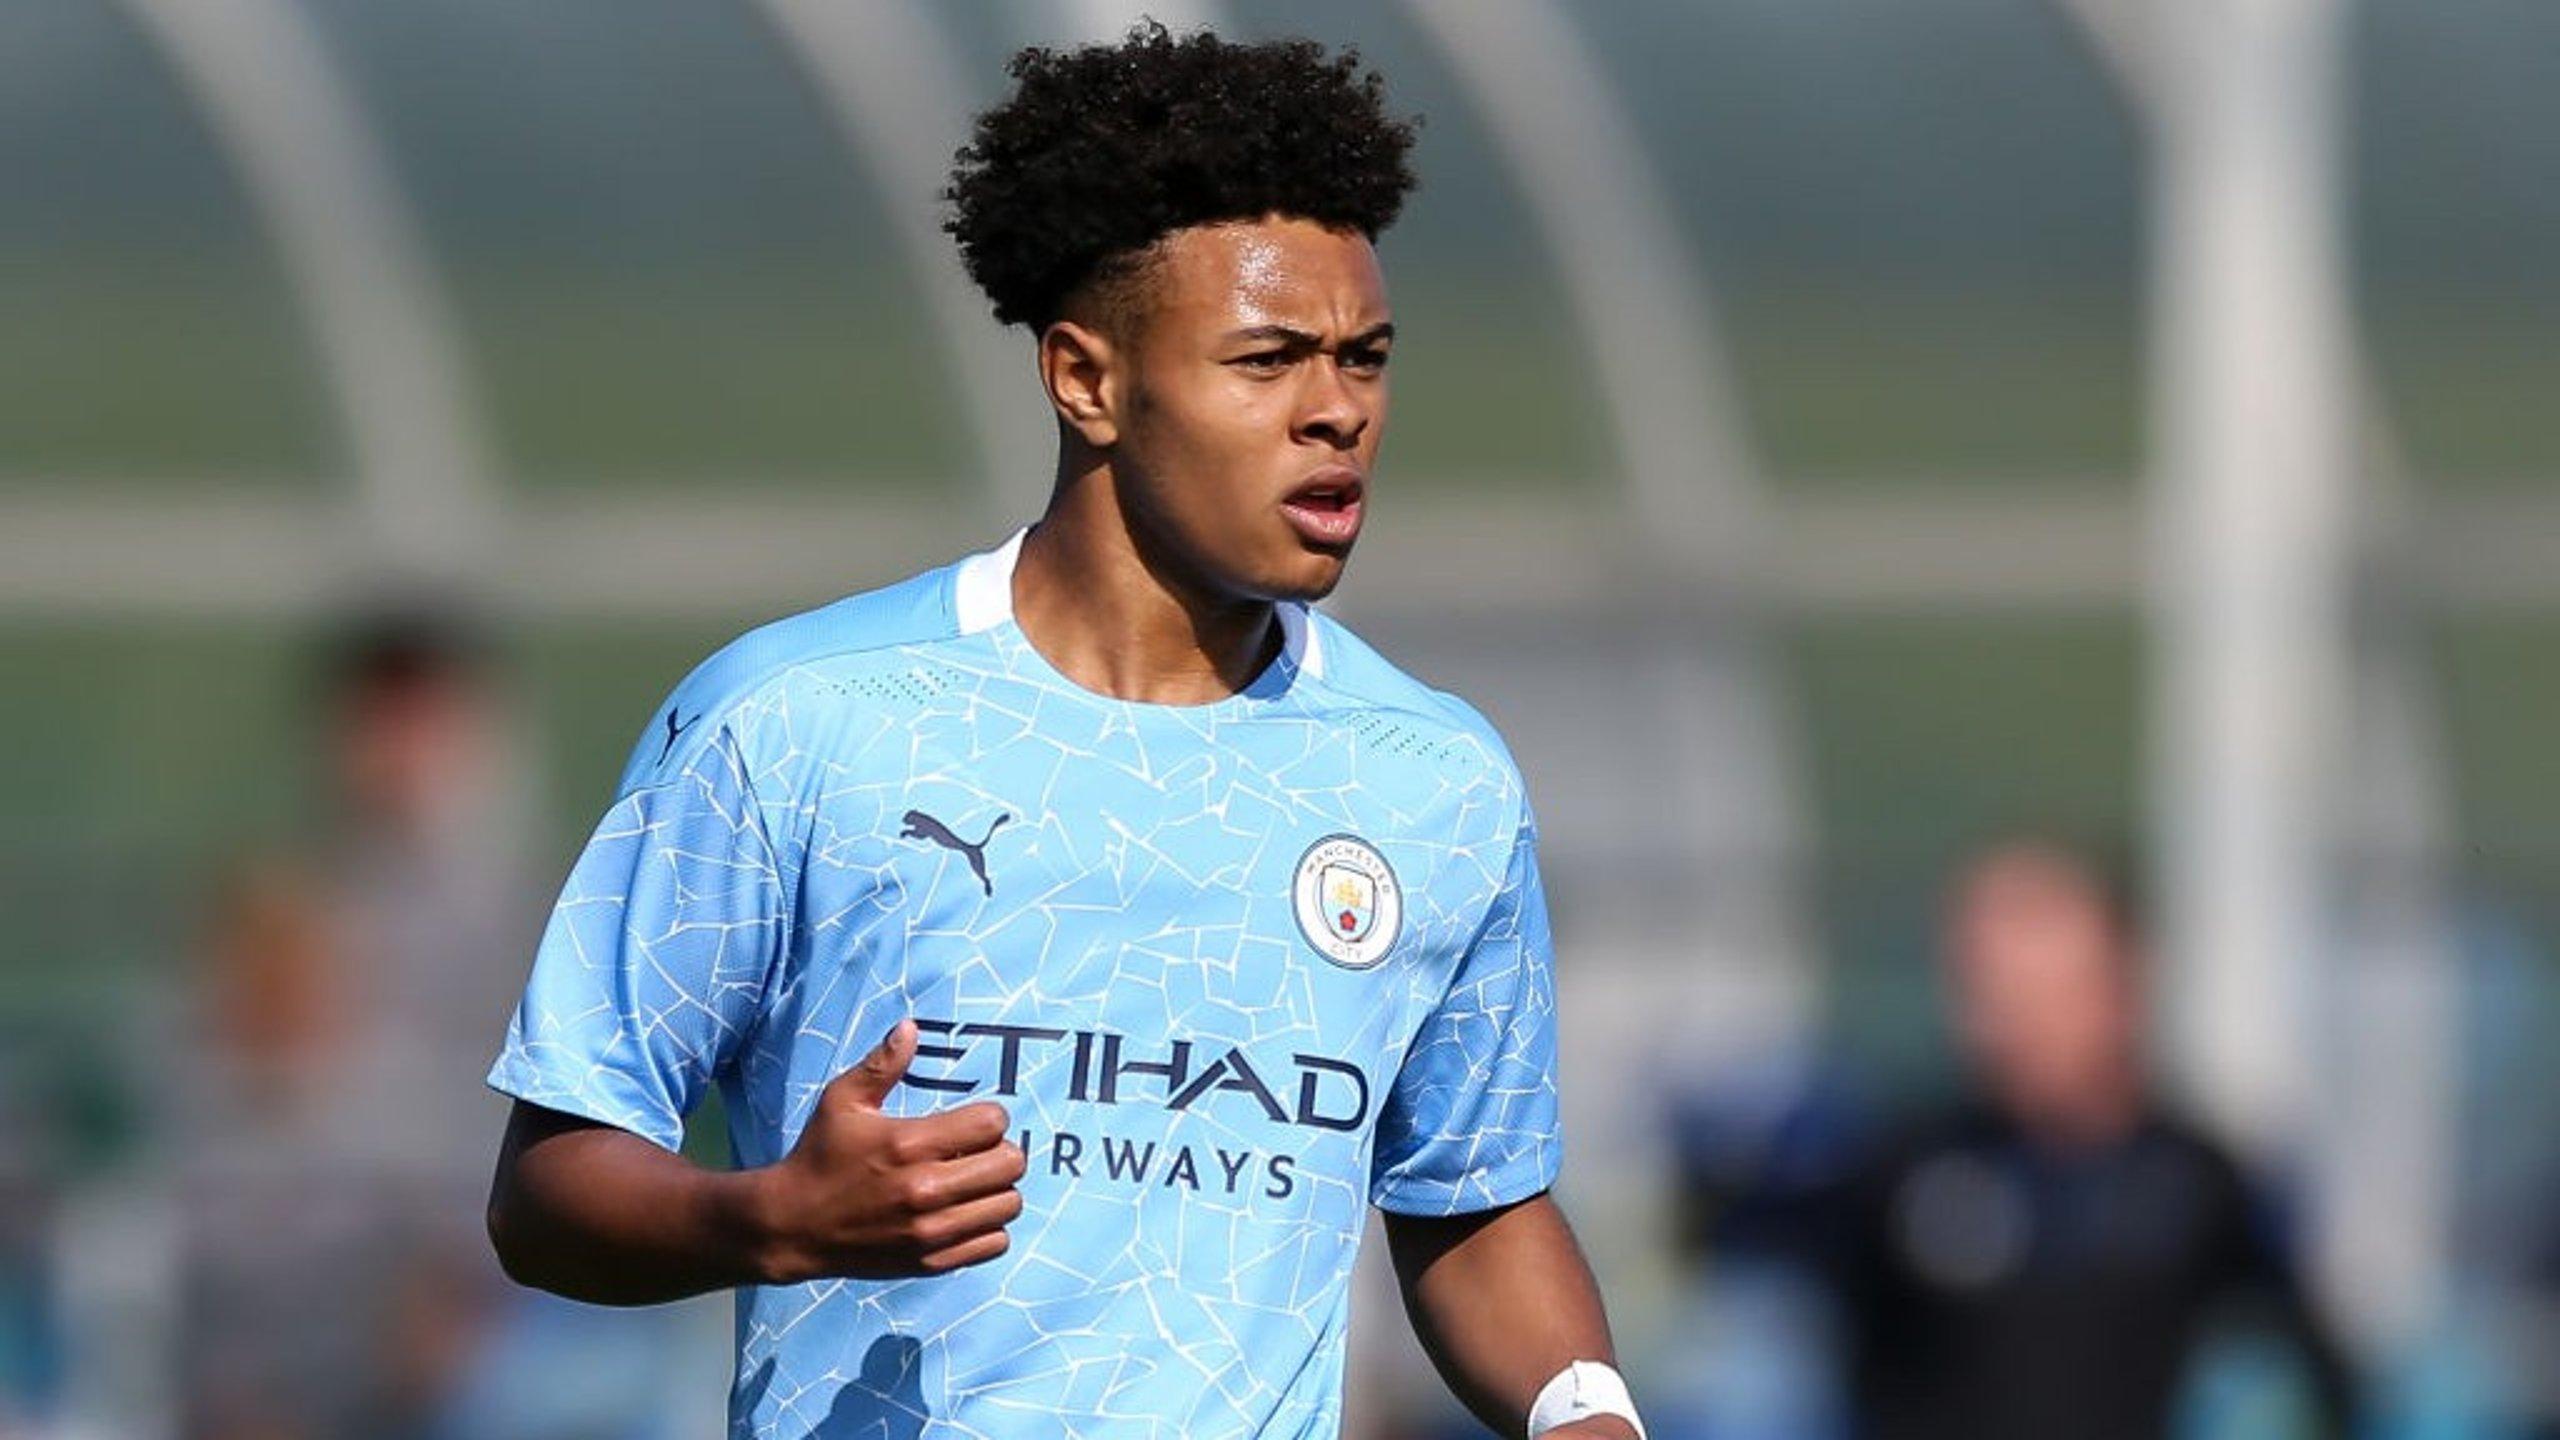 High fives as Under-18s see off Sunderland